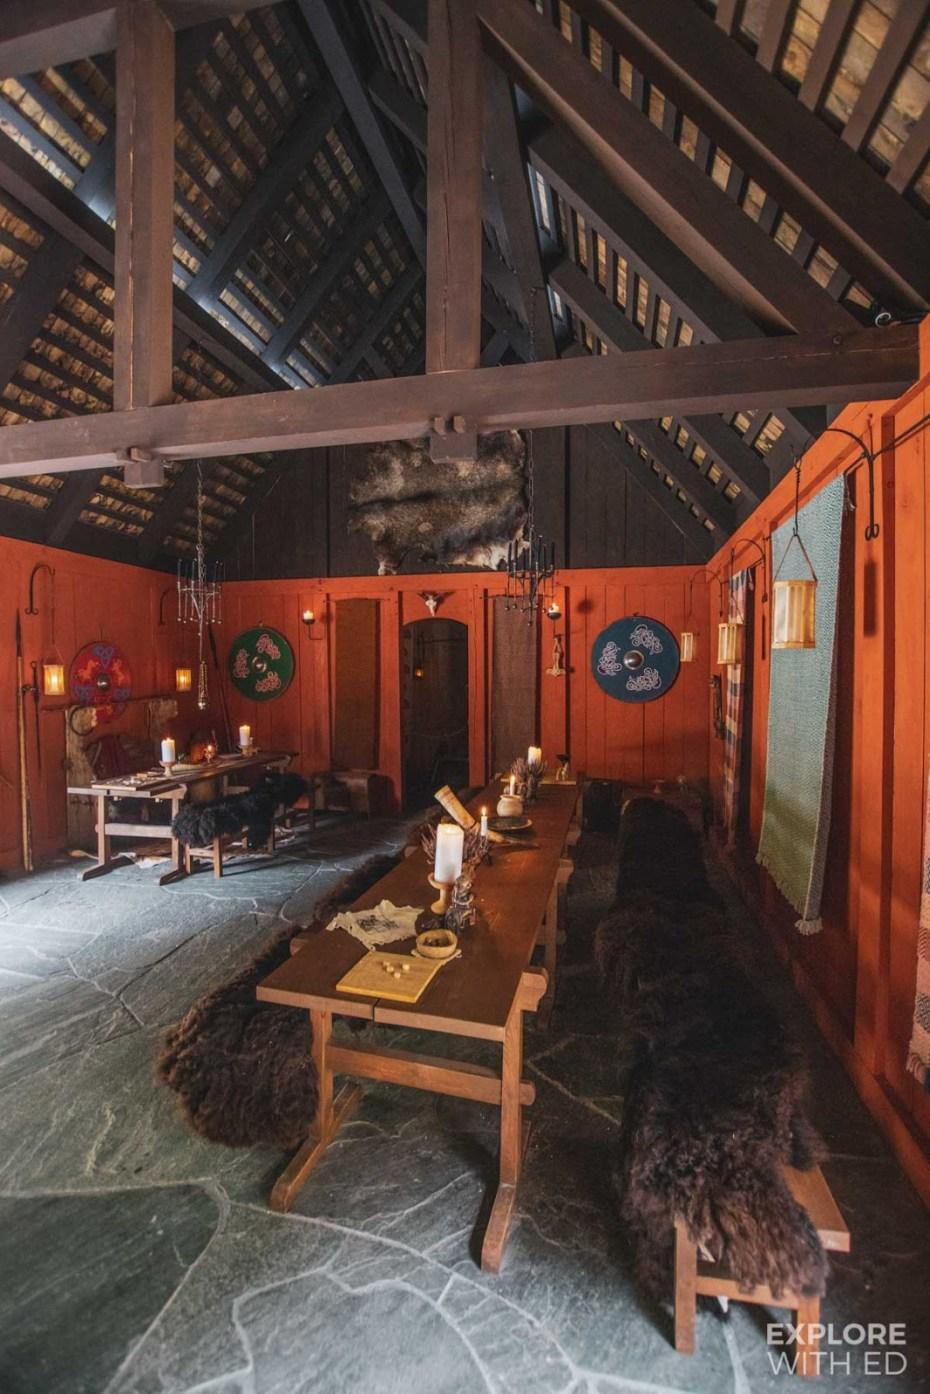 Communal dining room at the Njardarheimr Viking Valley